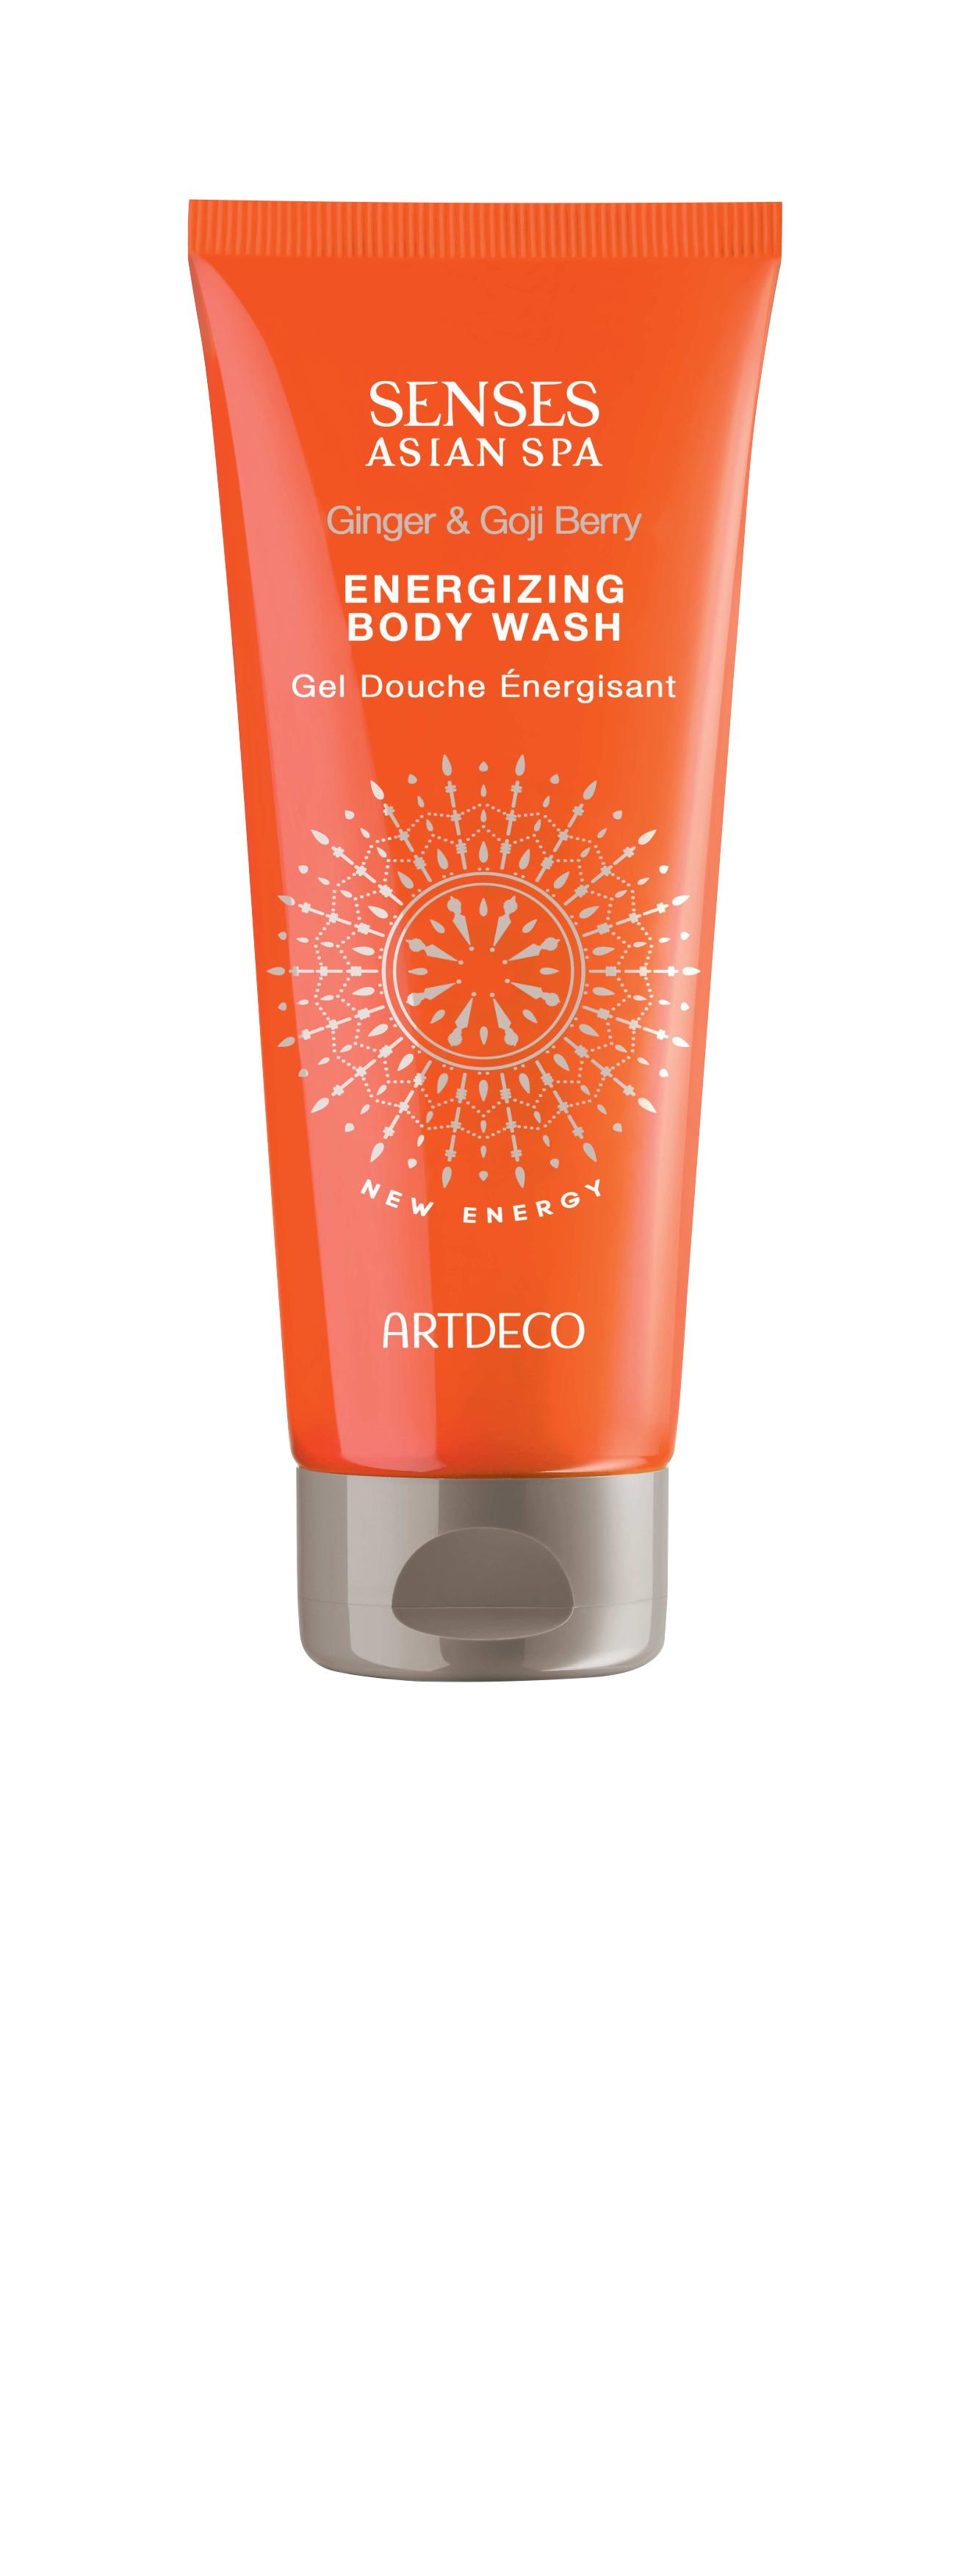 Artdeco гель для душа тонизирующий Energizing body wash, new energy, 200 мл65101Легкая бодрящая текстура Яркий аромат